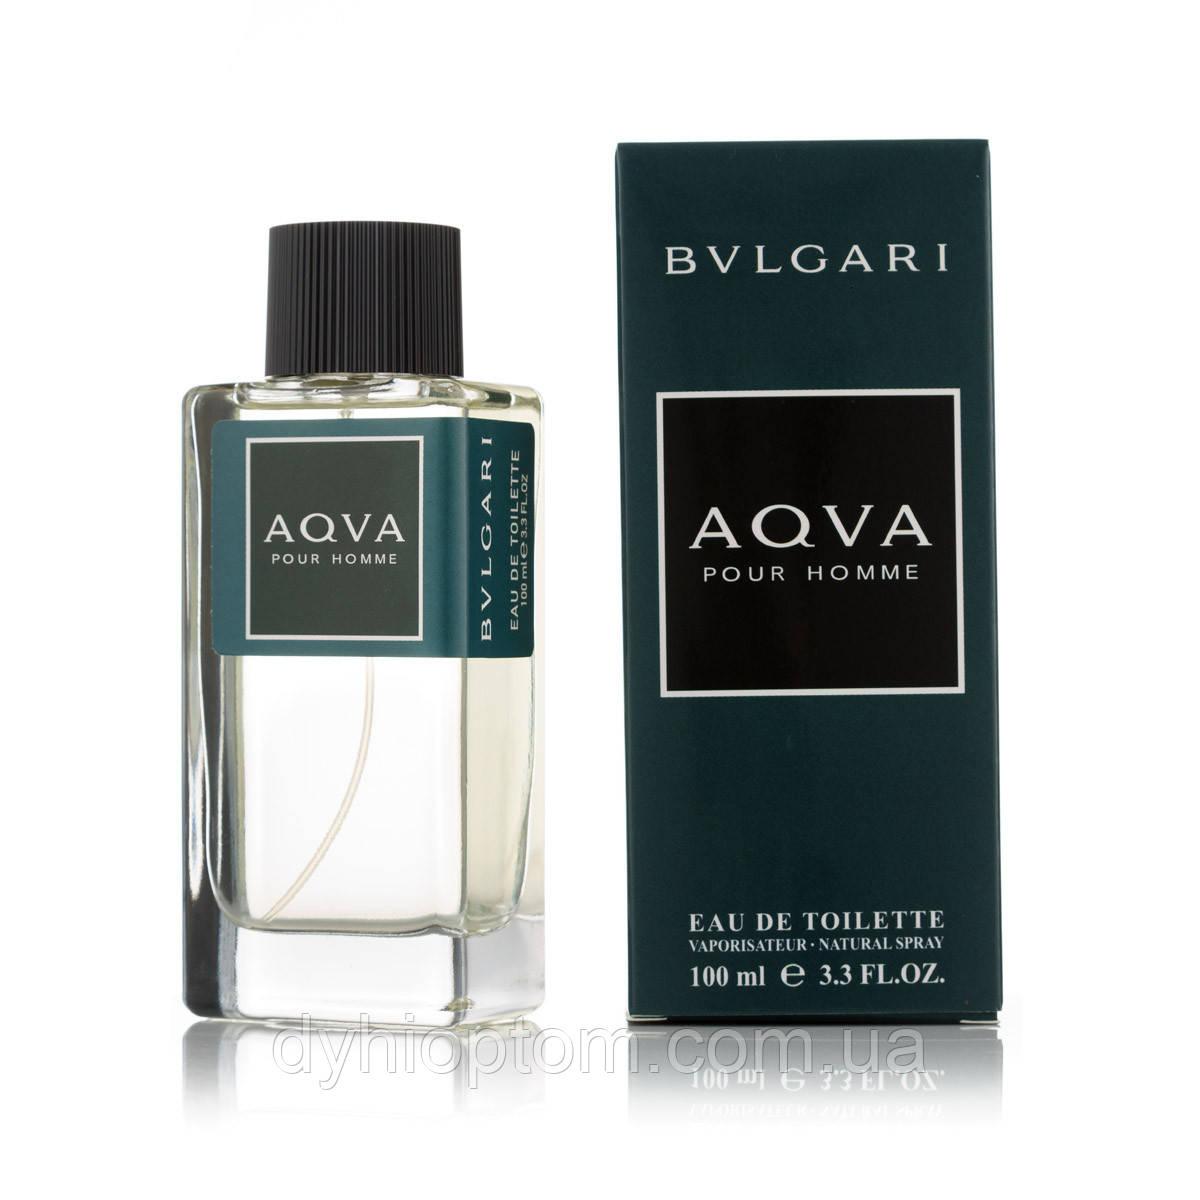 Чоловіча туалетна вода Bvlgari Aqva Pour Homme 100ml